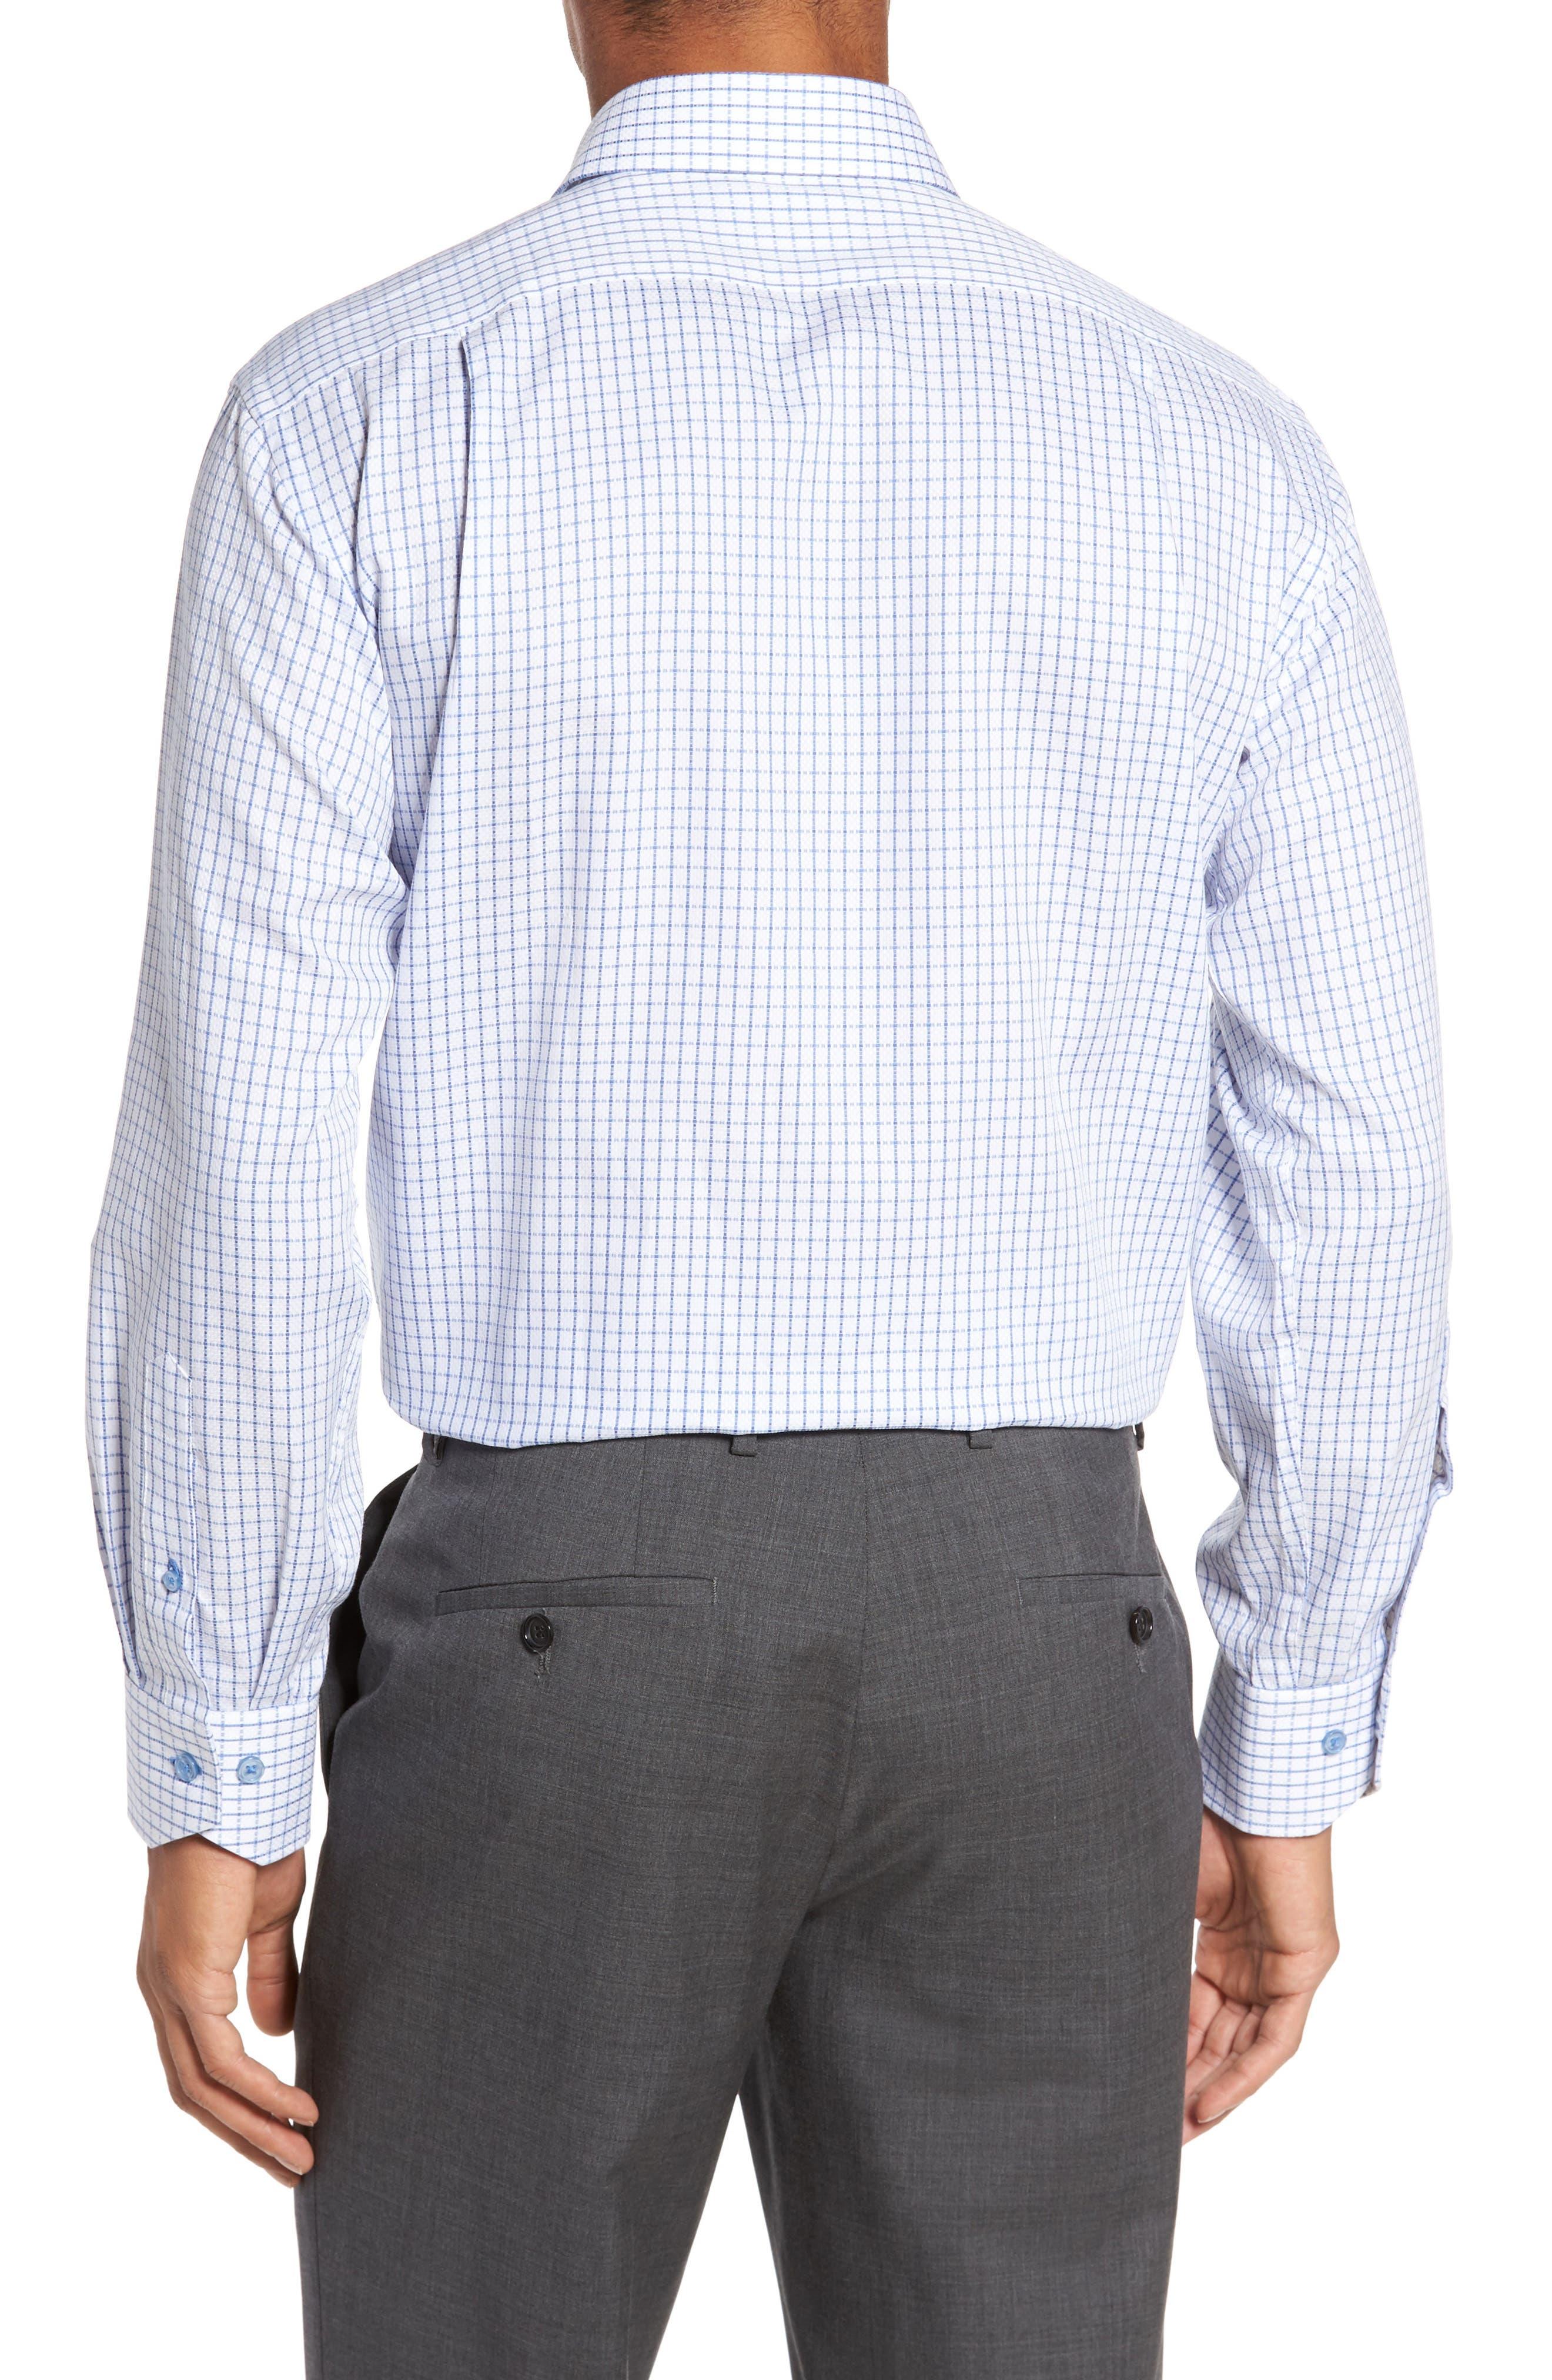 LORENZO UOMO, Trim Fit Textured Check Dress Shirt, Alternate thumbnail 2, color, LIGHT BLUE